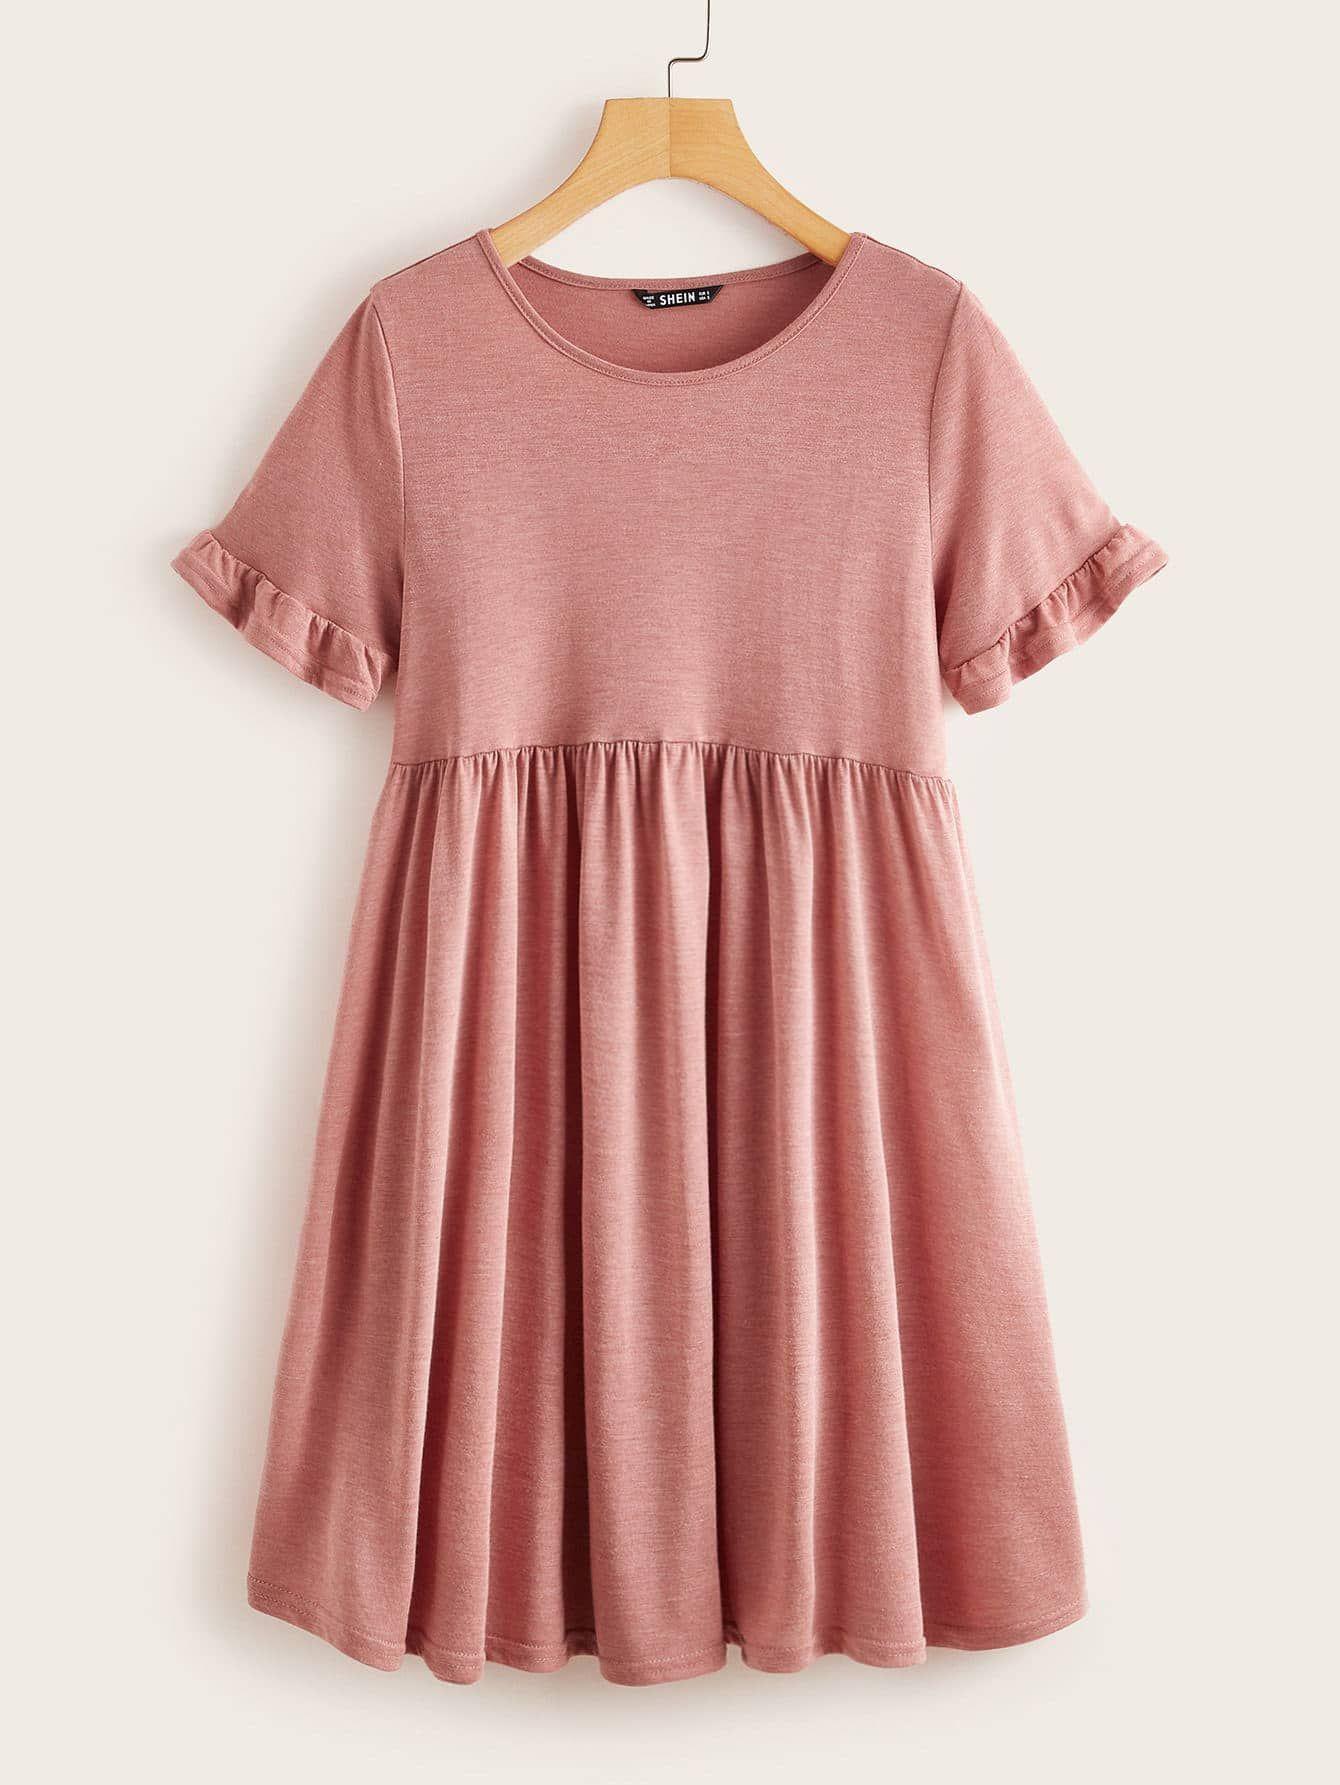 Shein Heather Knit Ruffle Cuff Smock Dress Xl Red Smocked Clothes Smock Dress Women S Fashion Leggings [ 1785 x 1340 Pixel ]